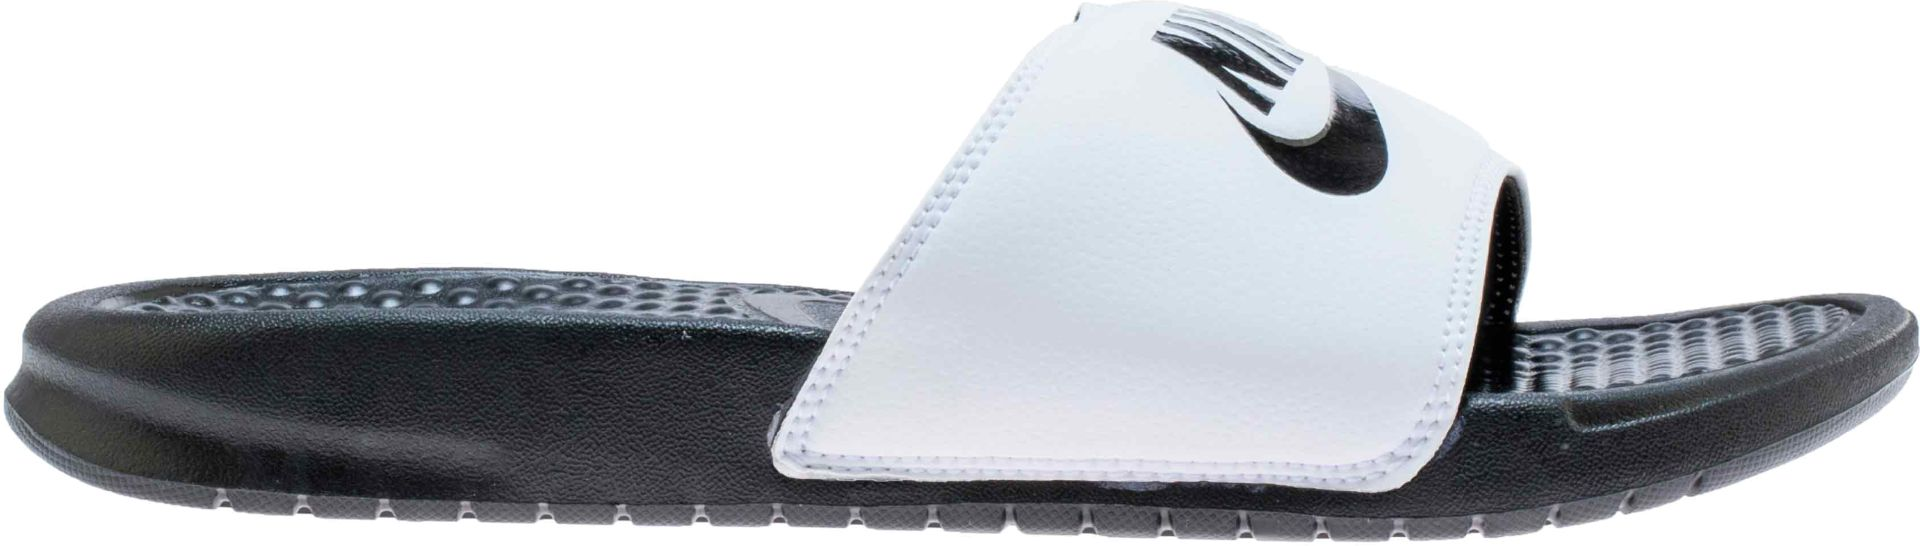 Nike Benassi JDI Slide - 343880-100